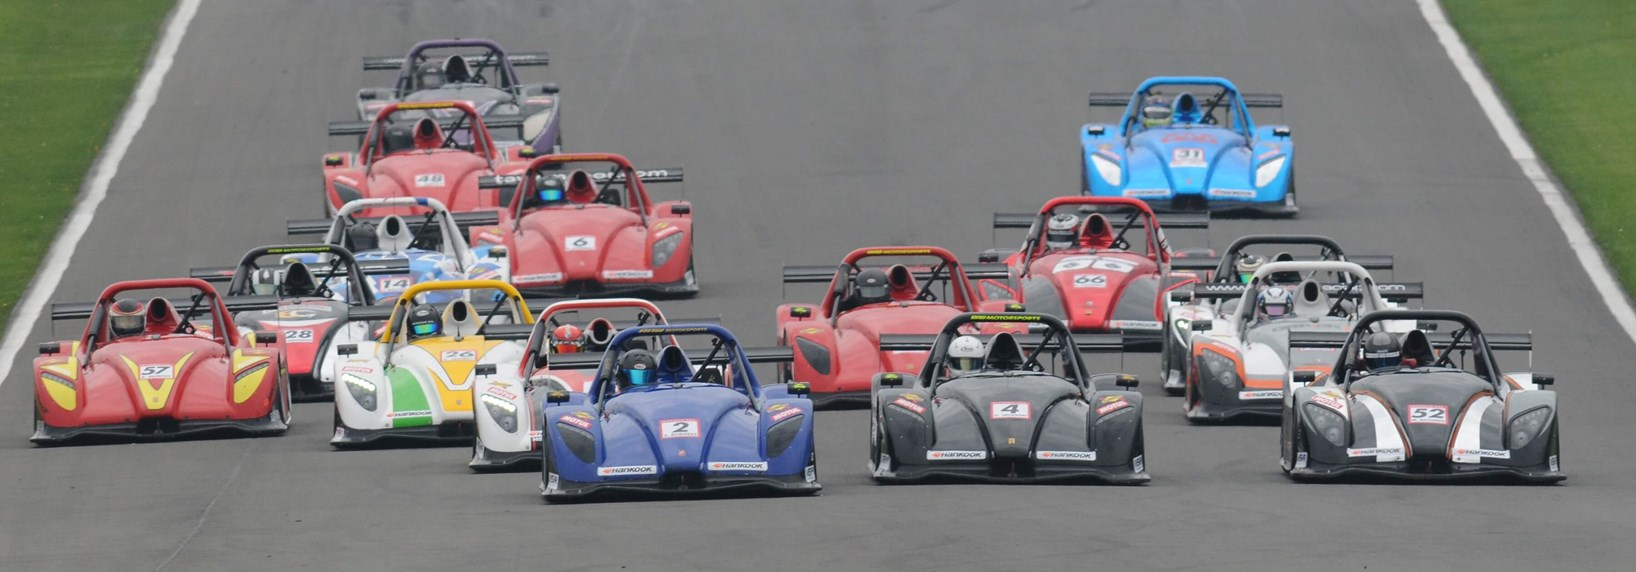 MSVR - Radical Challenge Championship